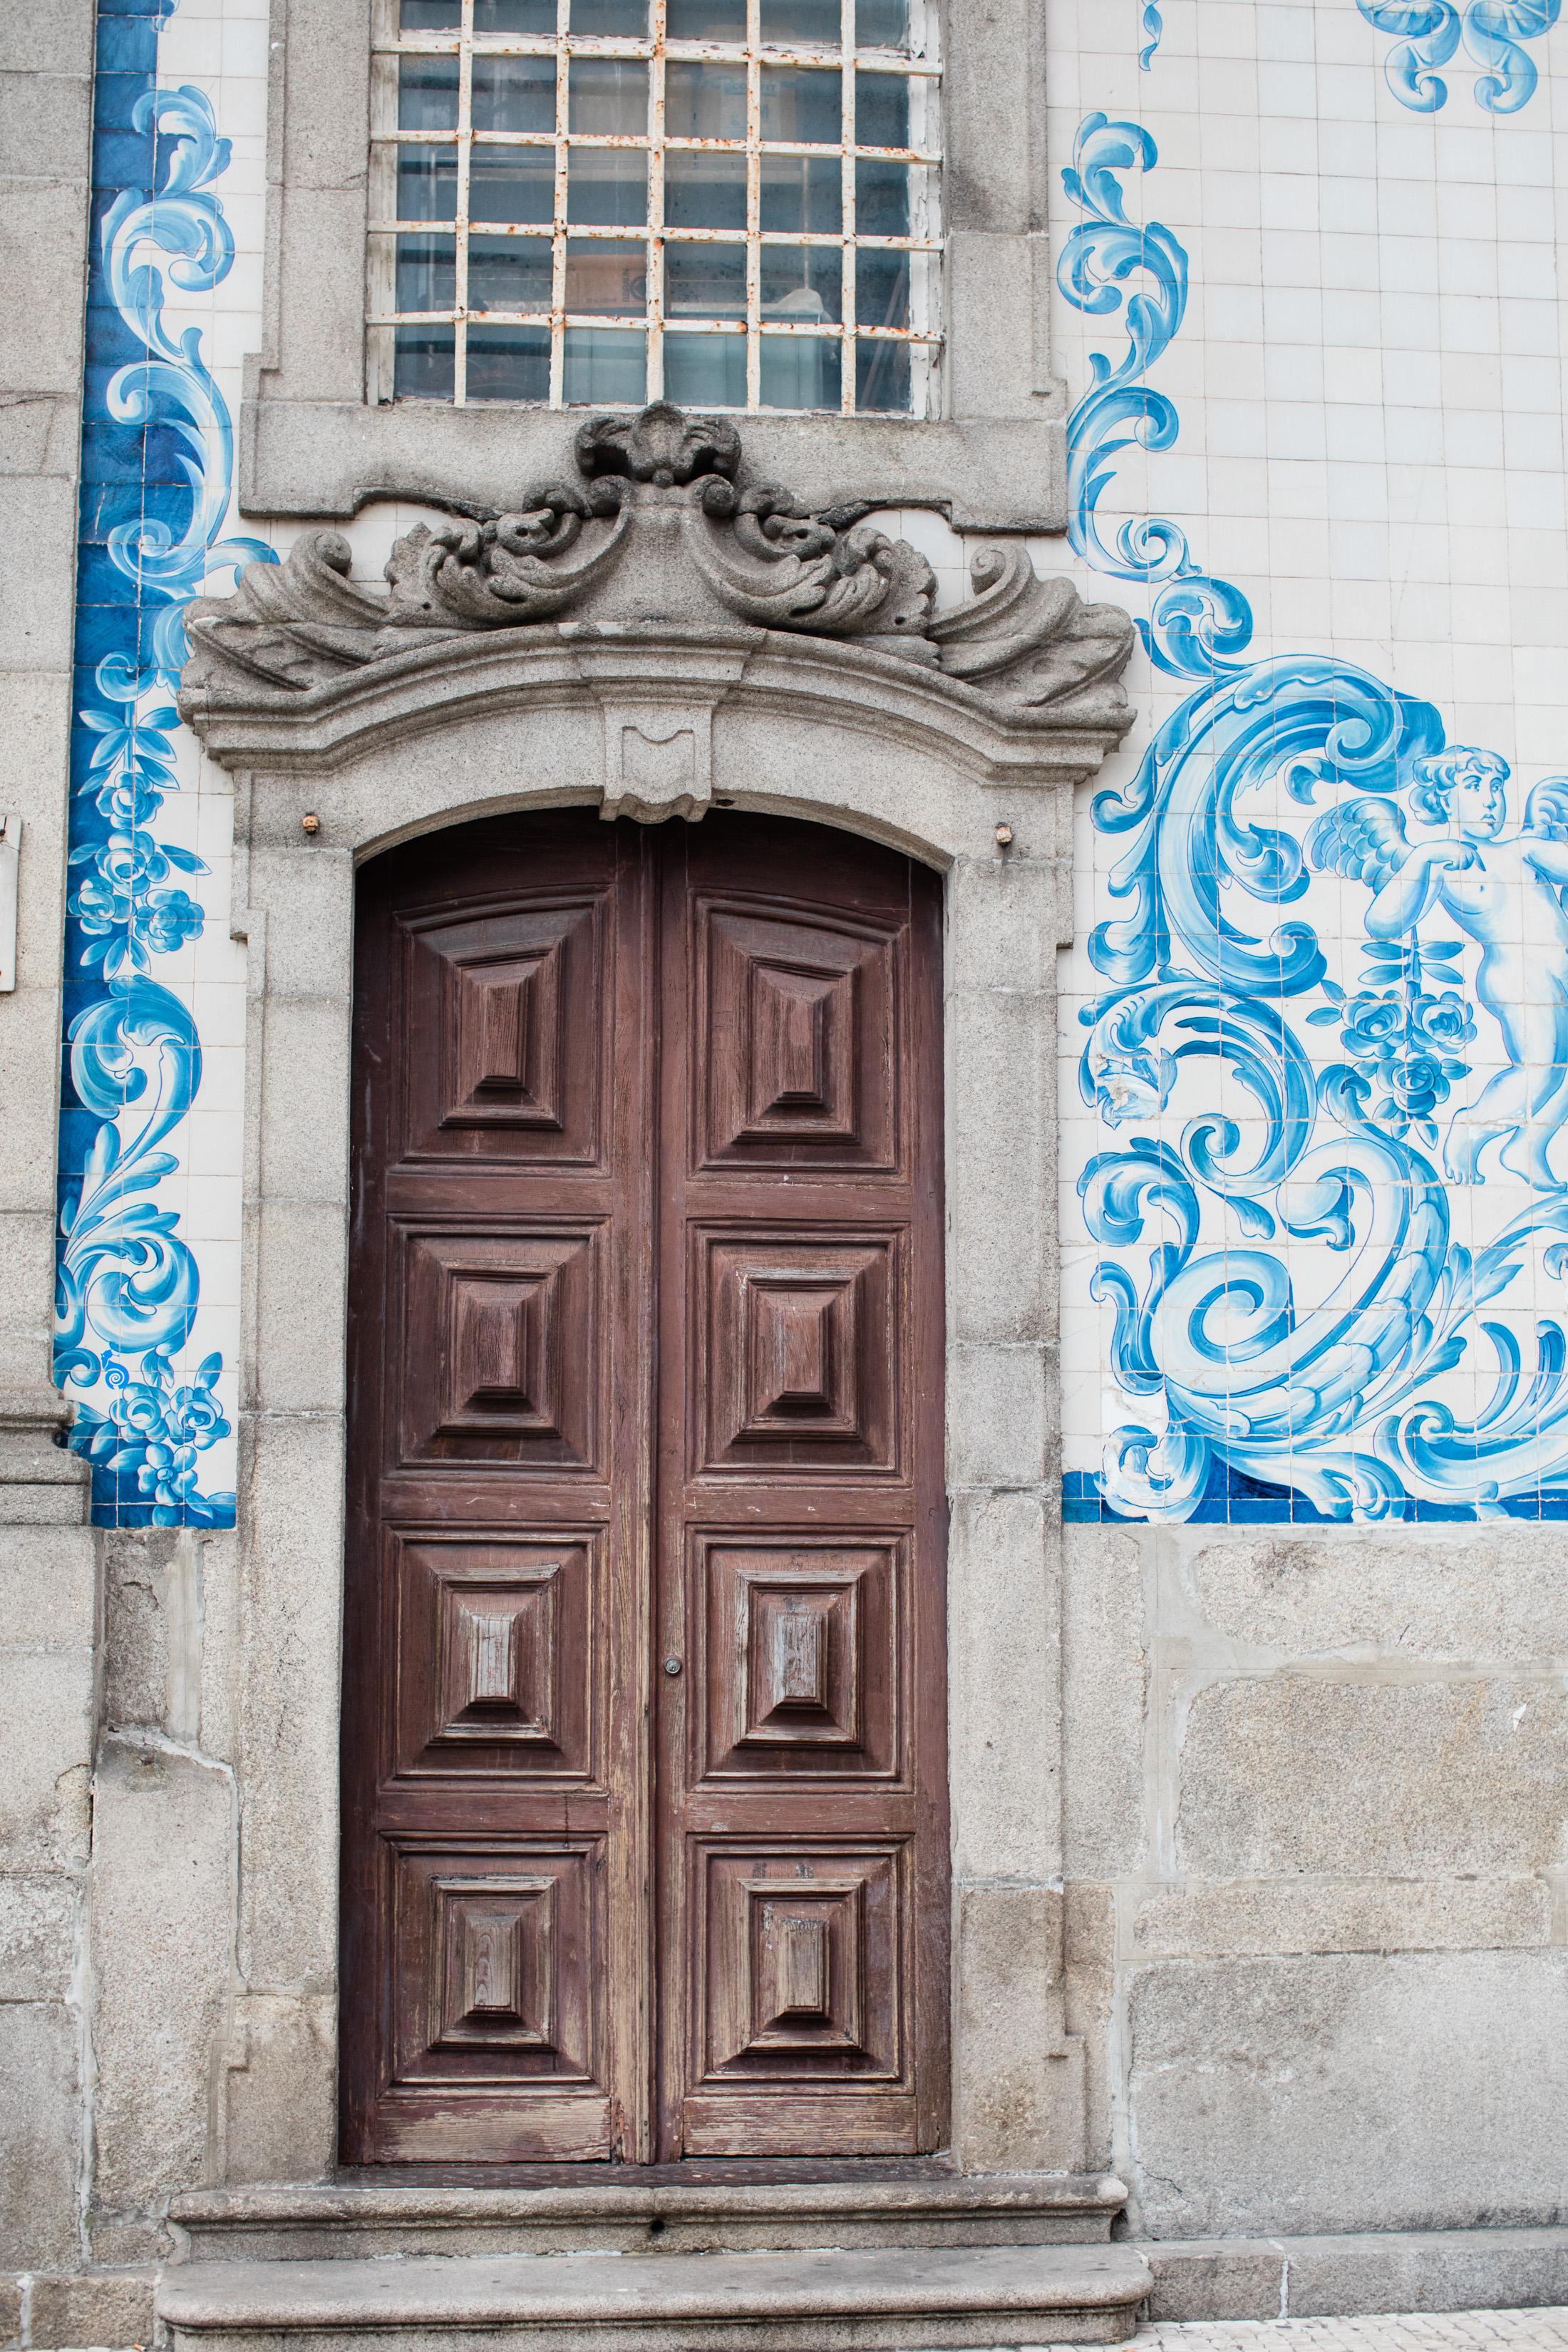 PortoPortugal_August2018-3.jpg